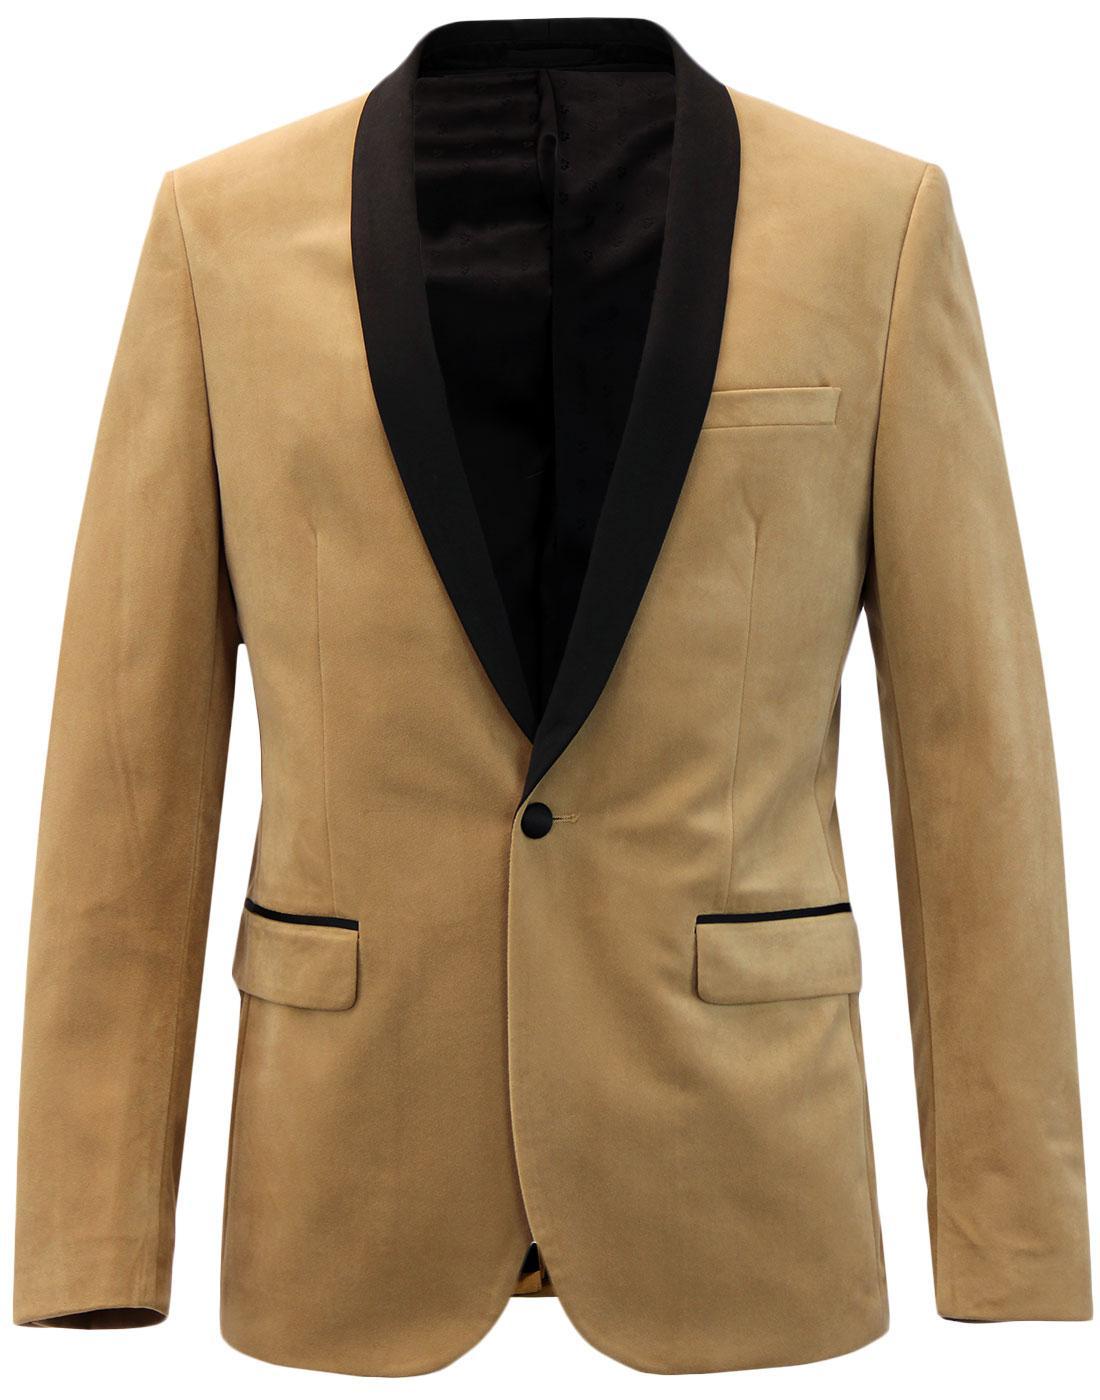 Keeling FARAH Retro 70s Shawl Collar Velvet Blazer